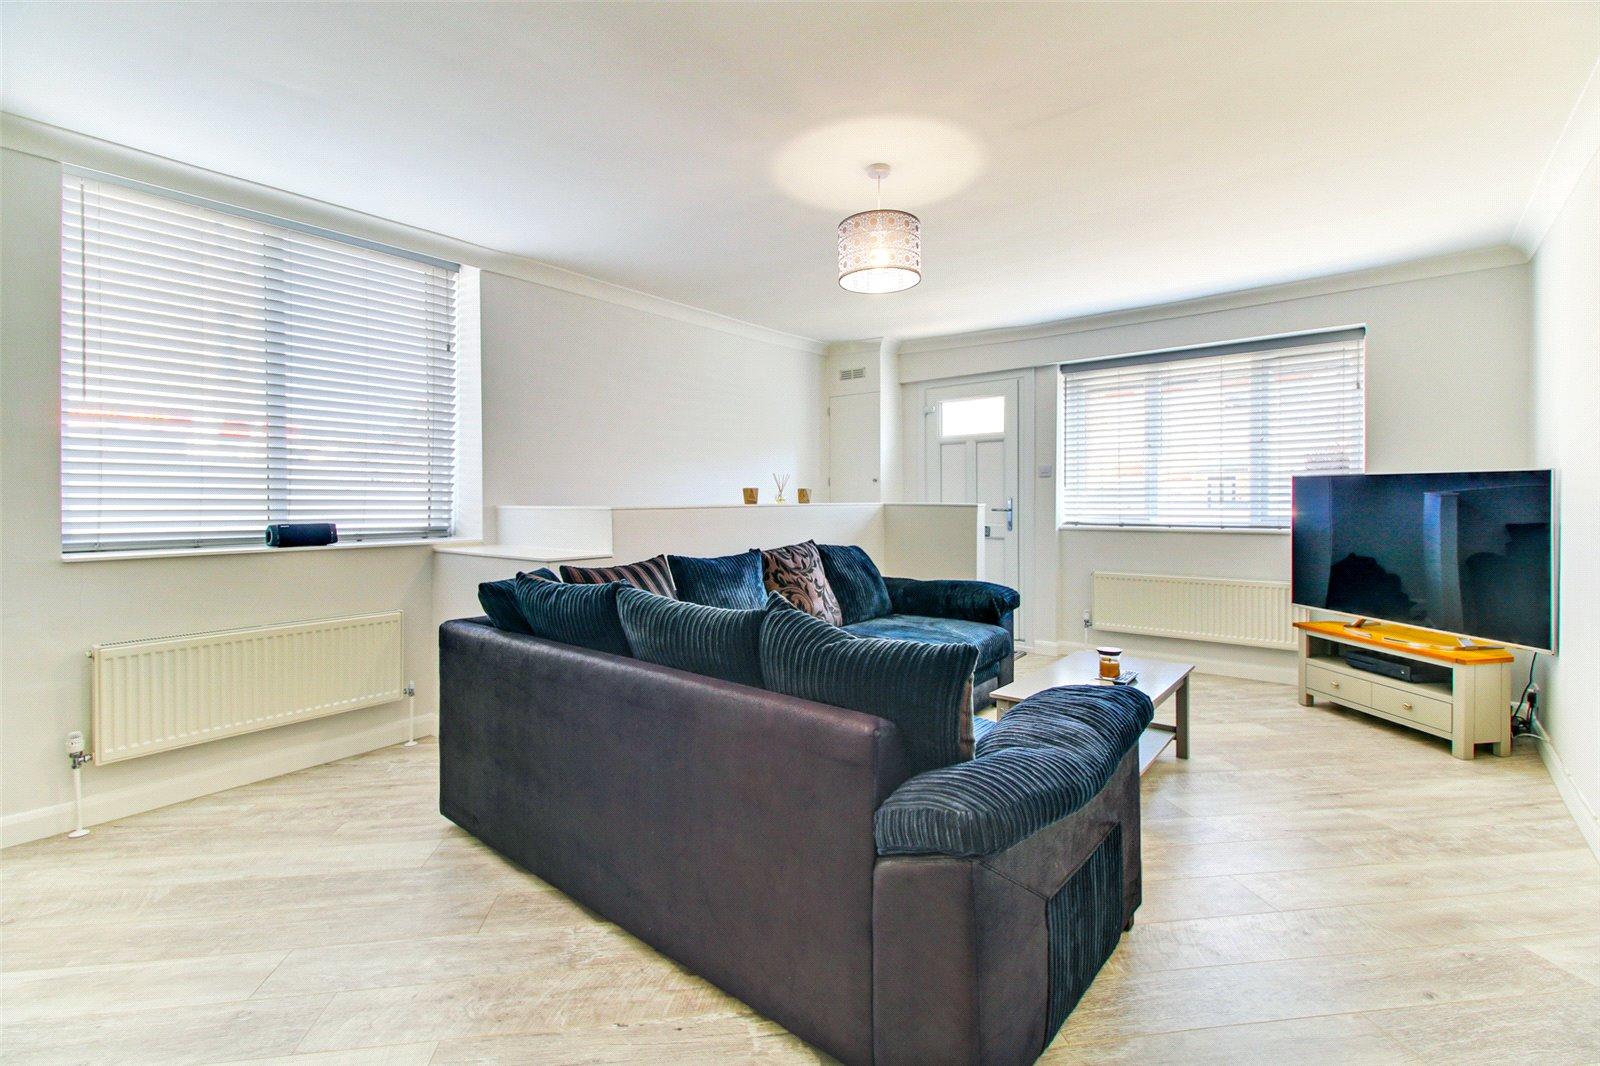 2 bed maisonette for sale in Upper Fant Road, Maidstone, ME16